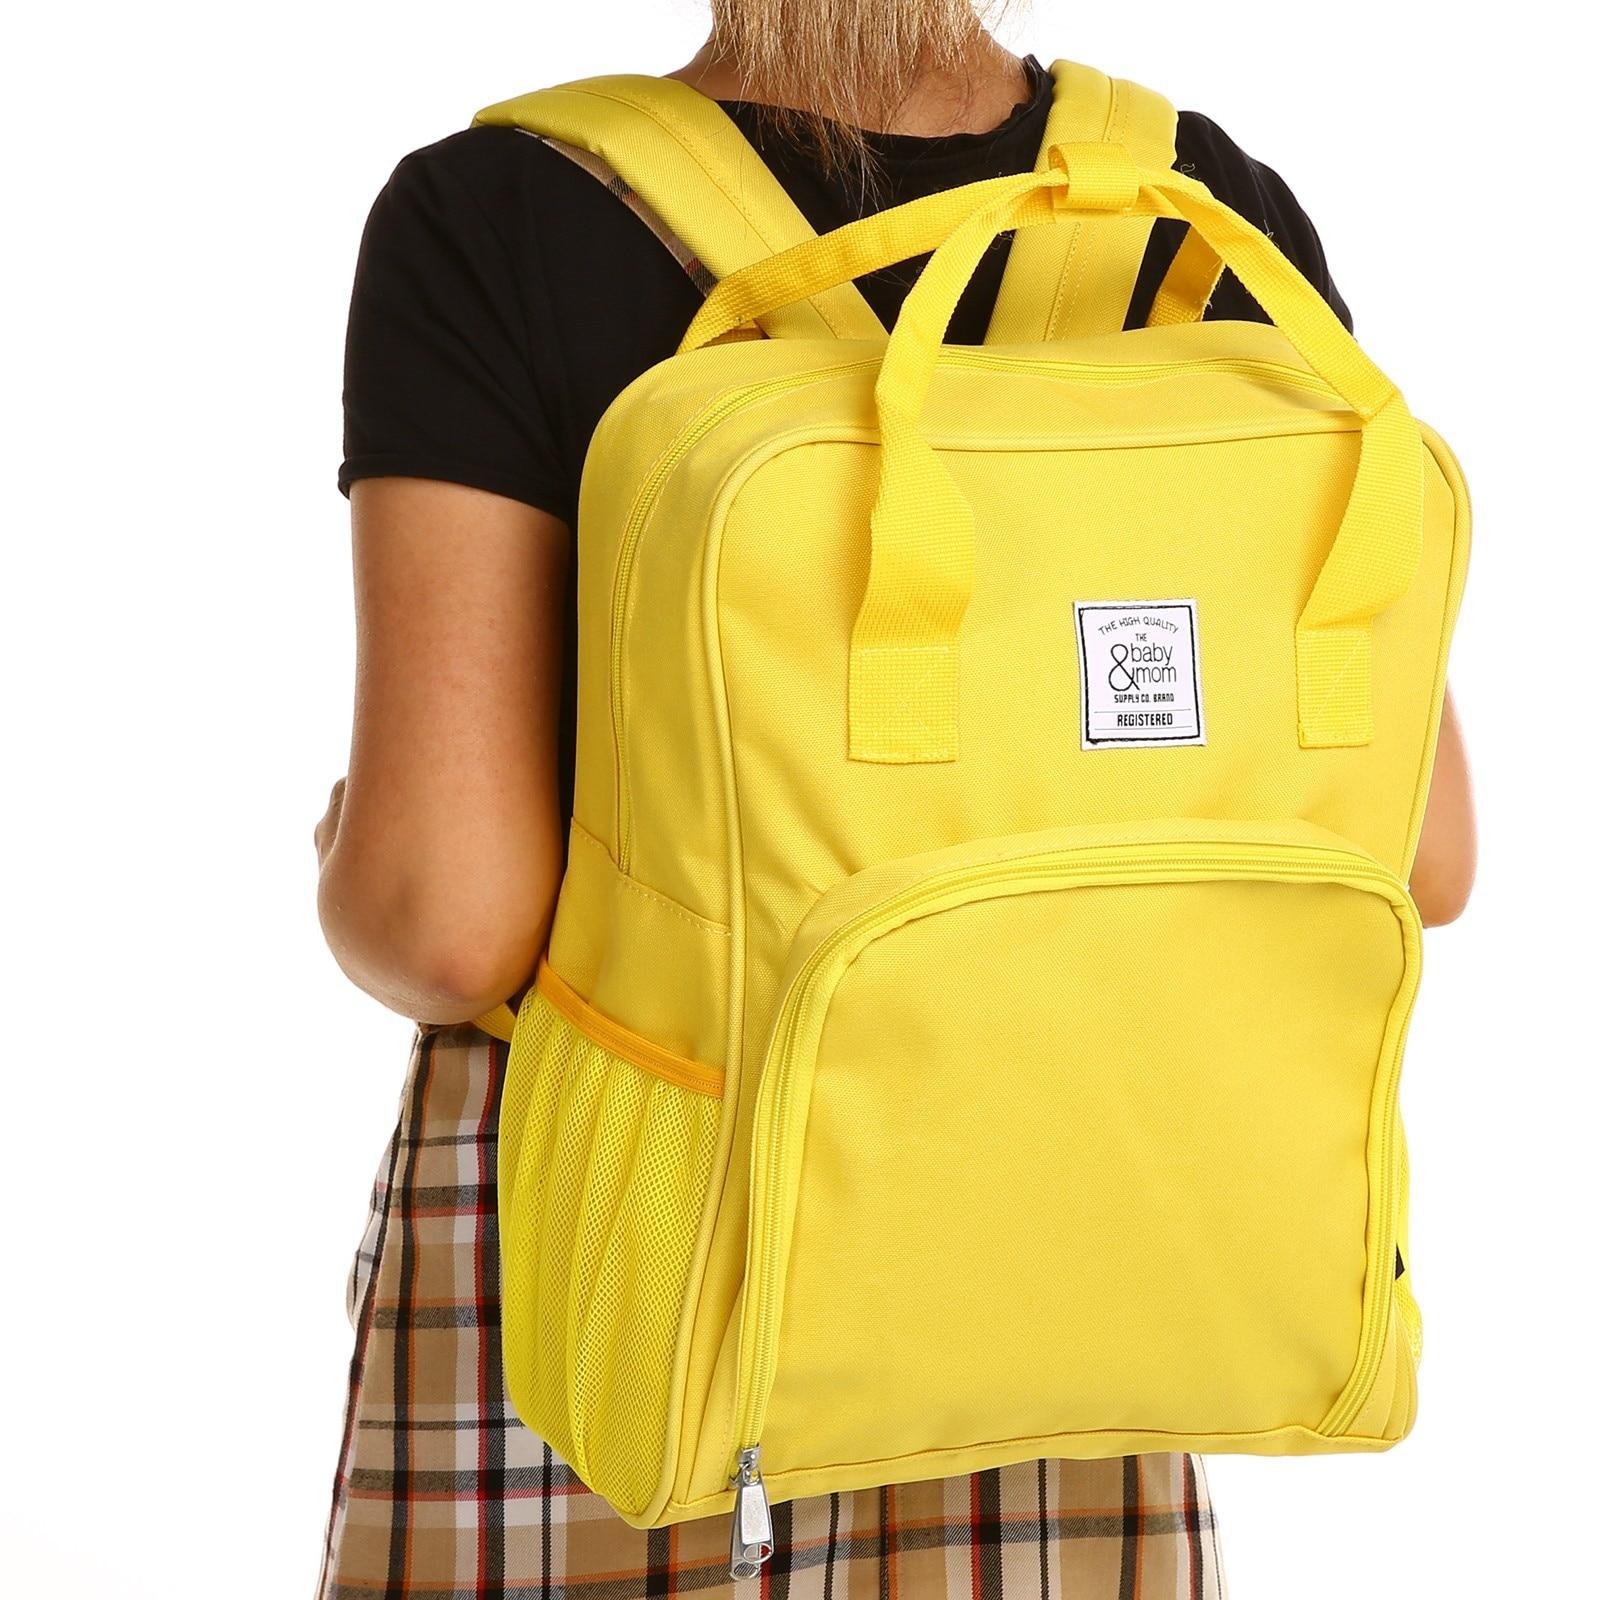 Ebebek Babymom Baby&Mom Multipurpose Rainbow Backpack Bag